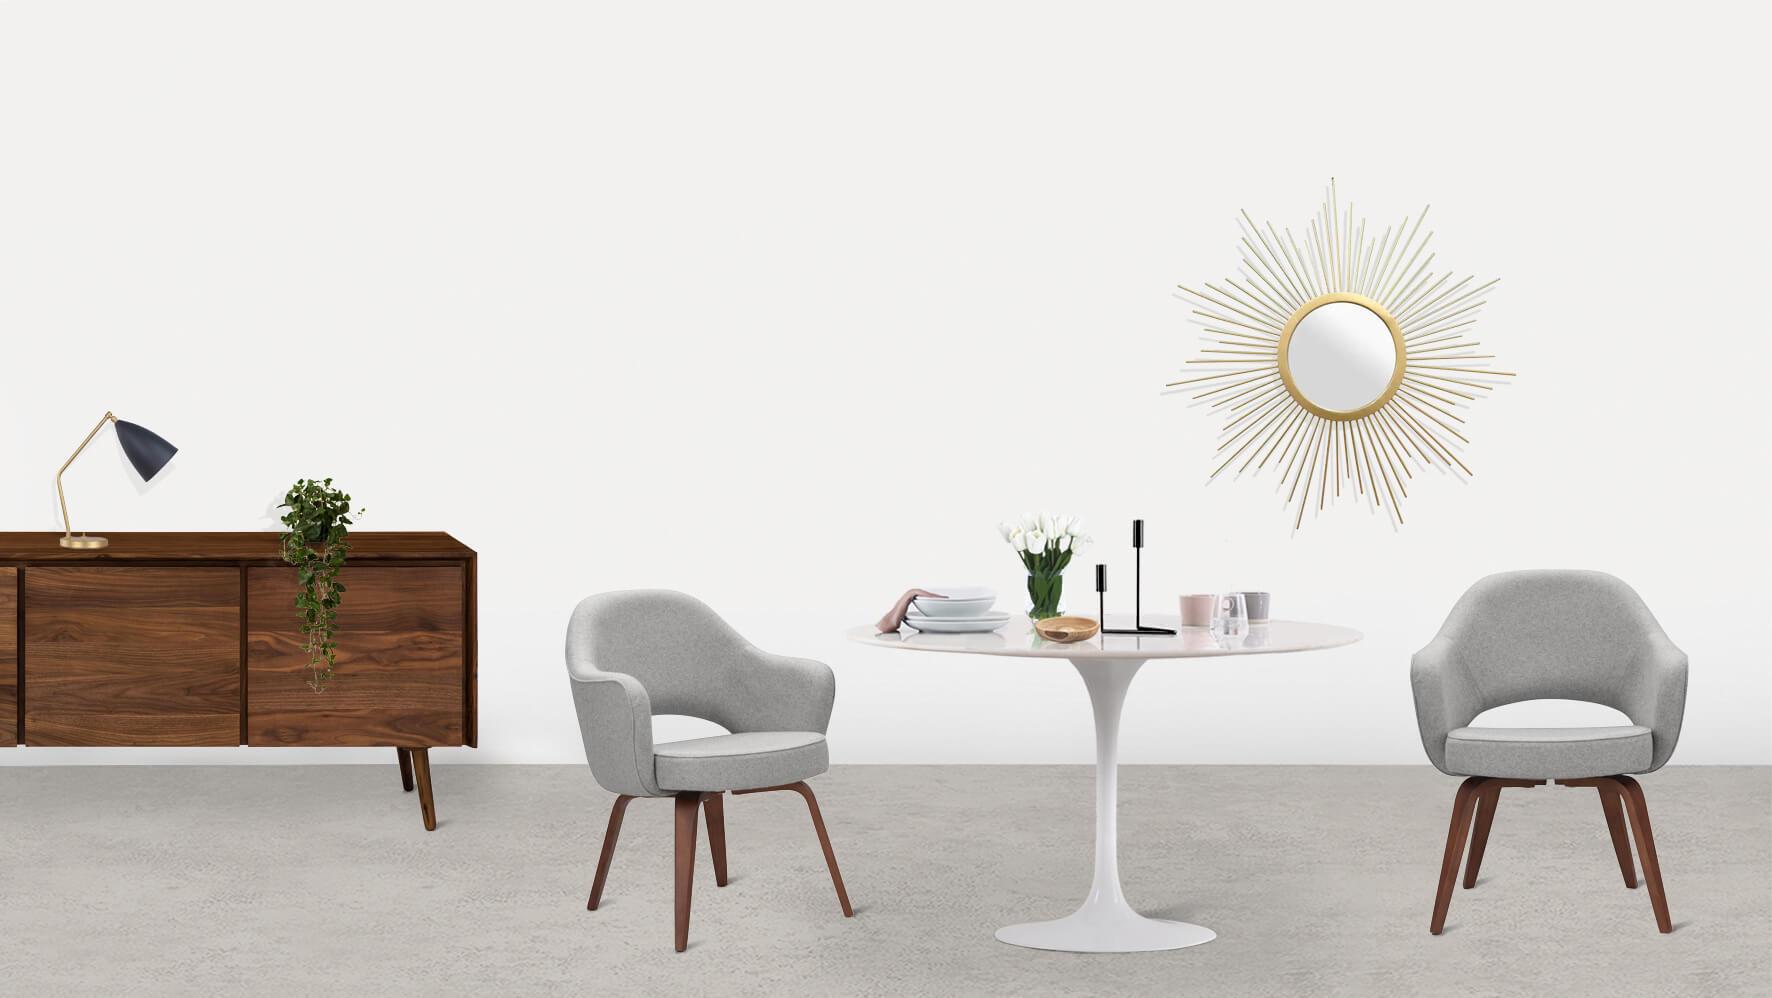 Product interior